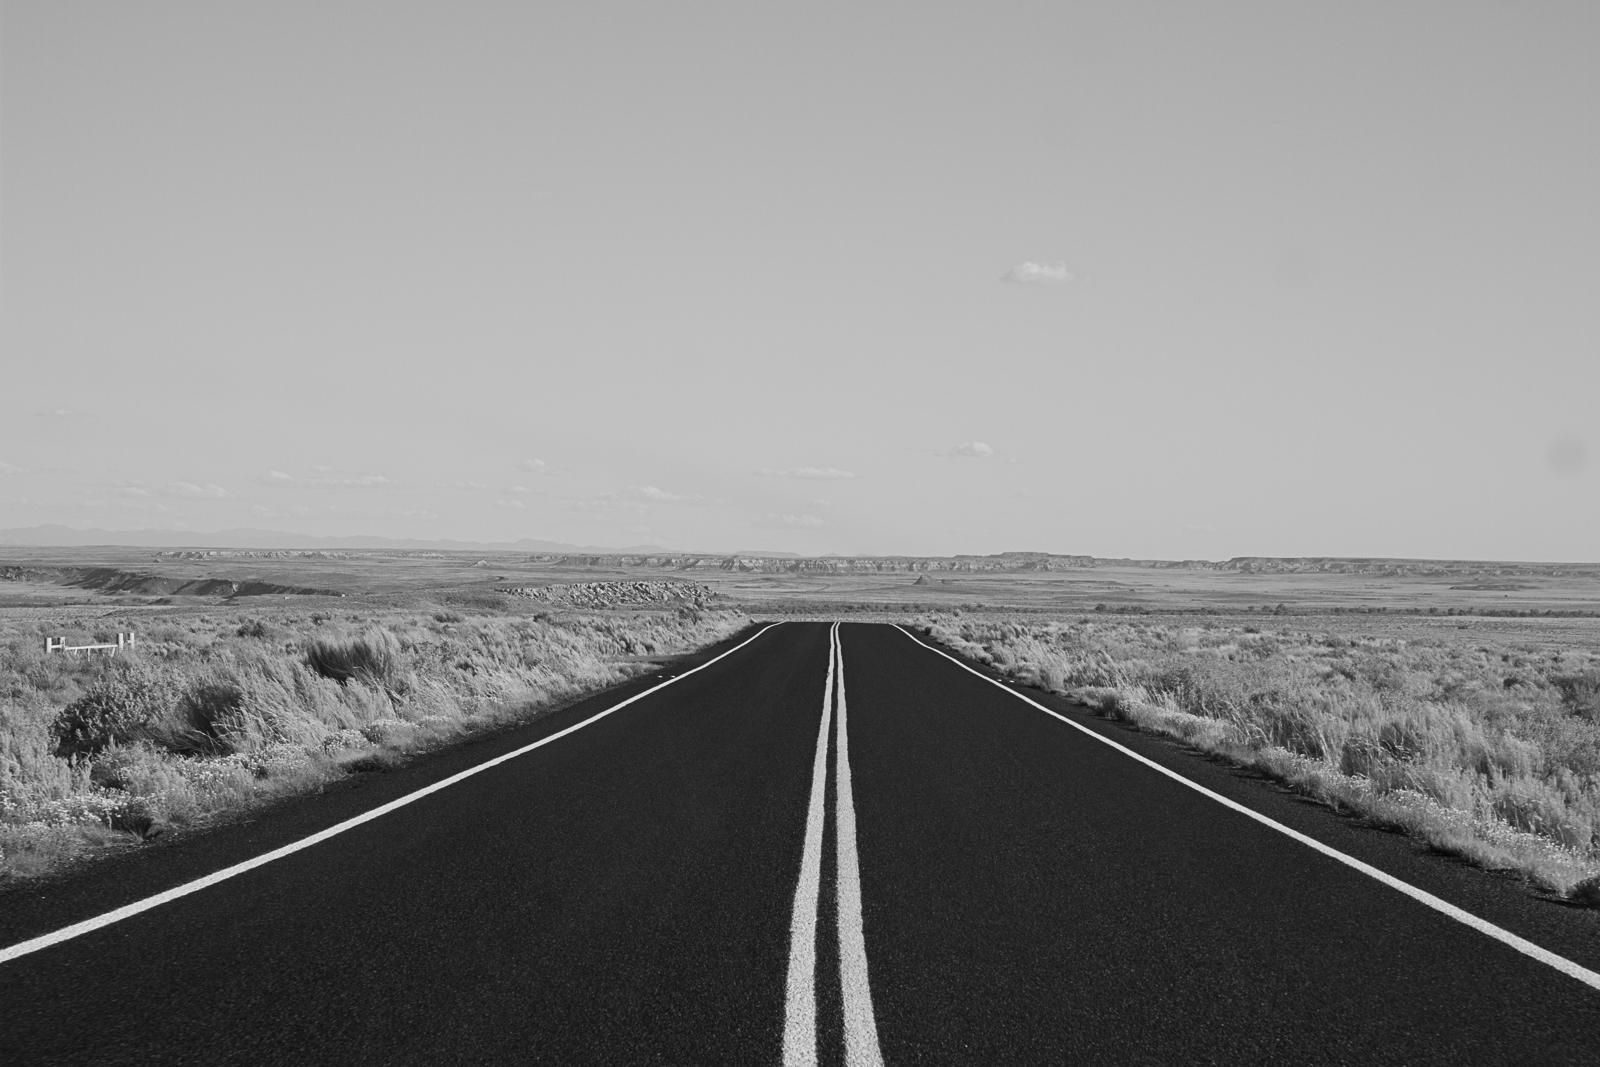 Road_new_02.jpg